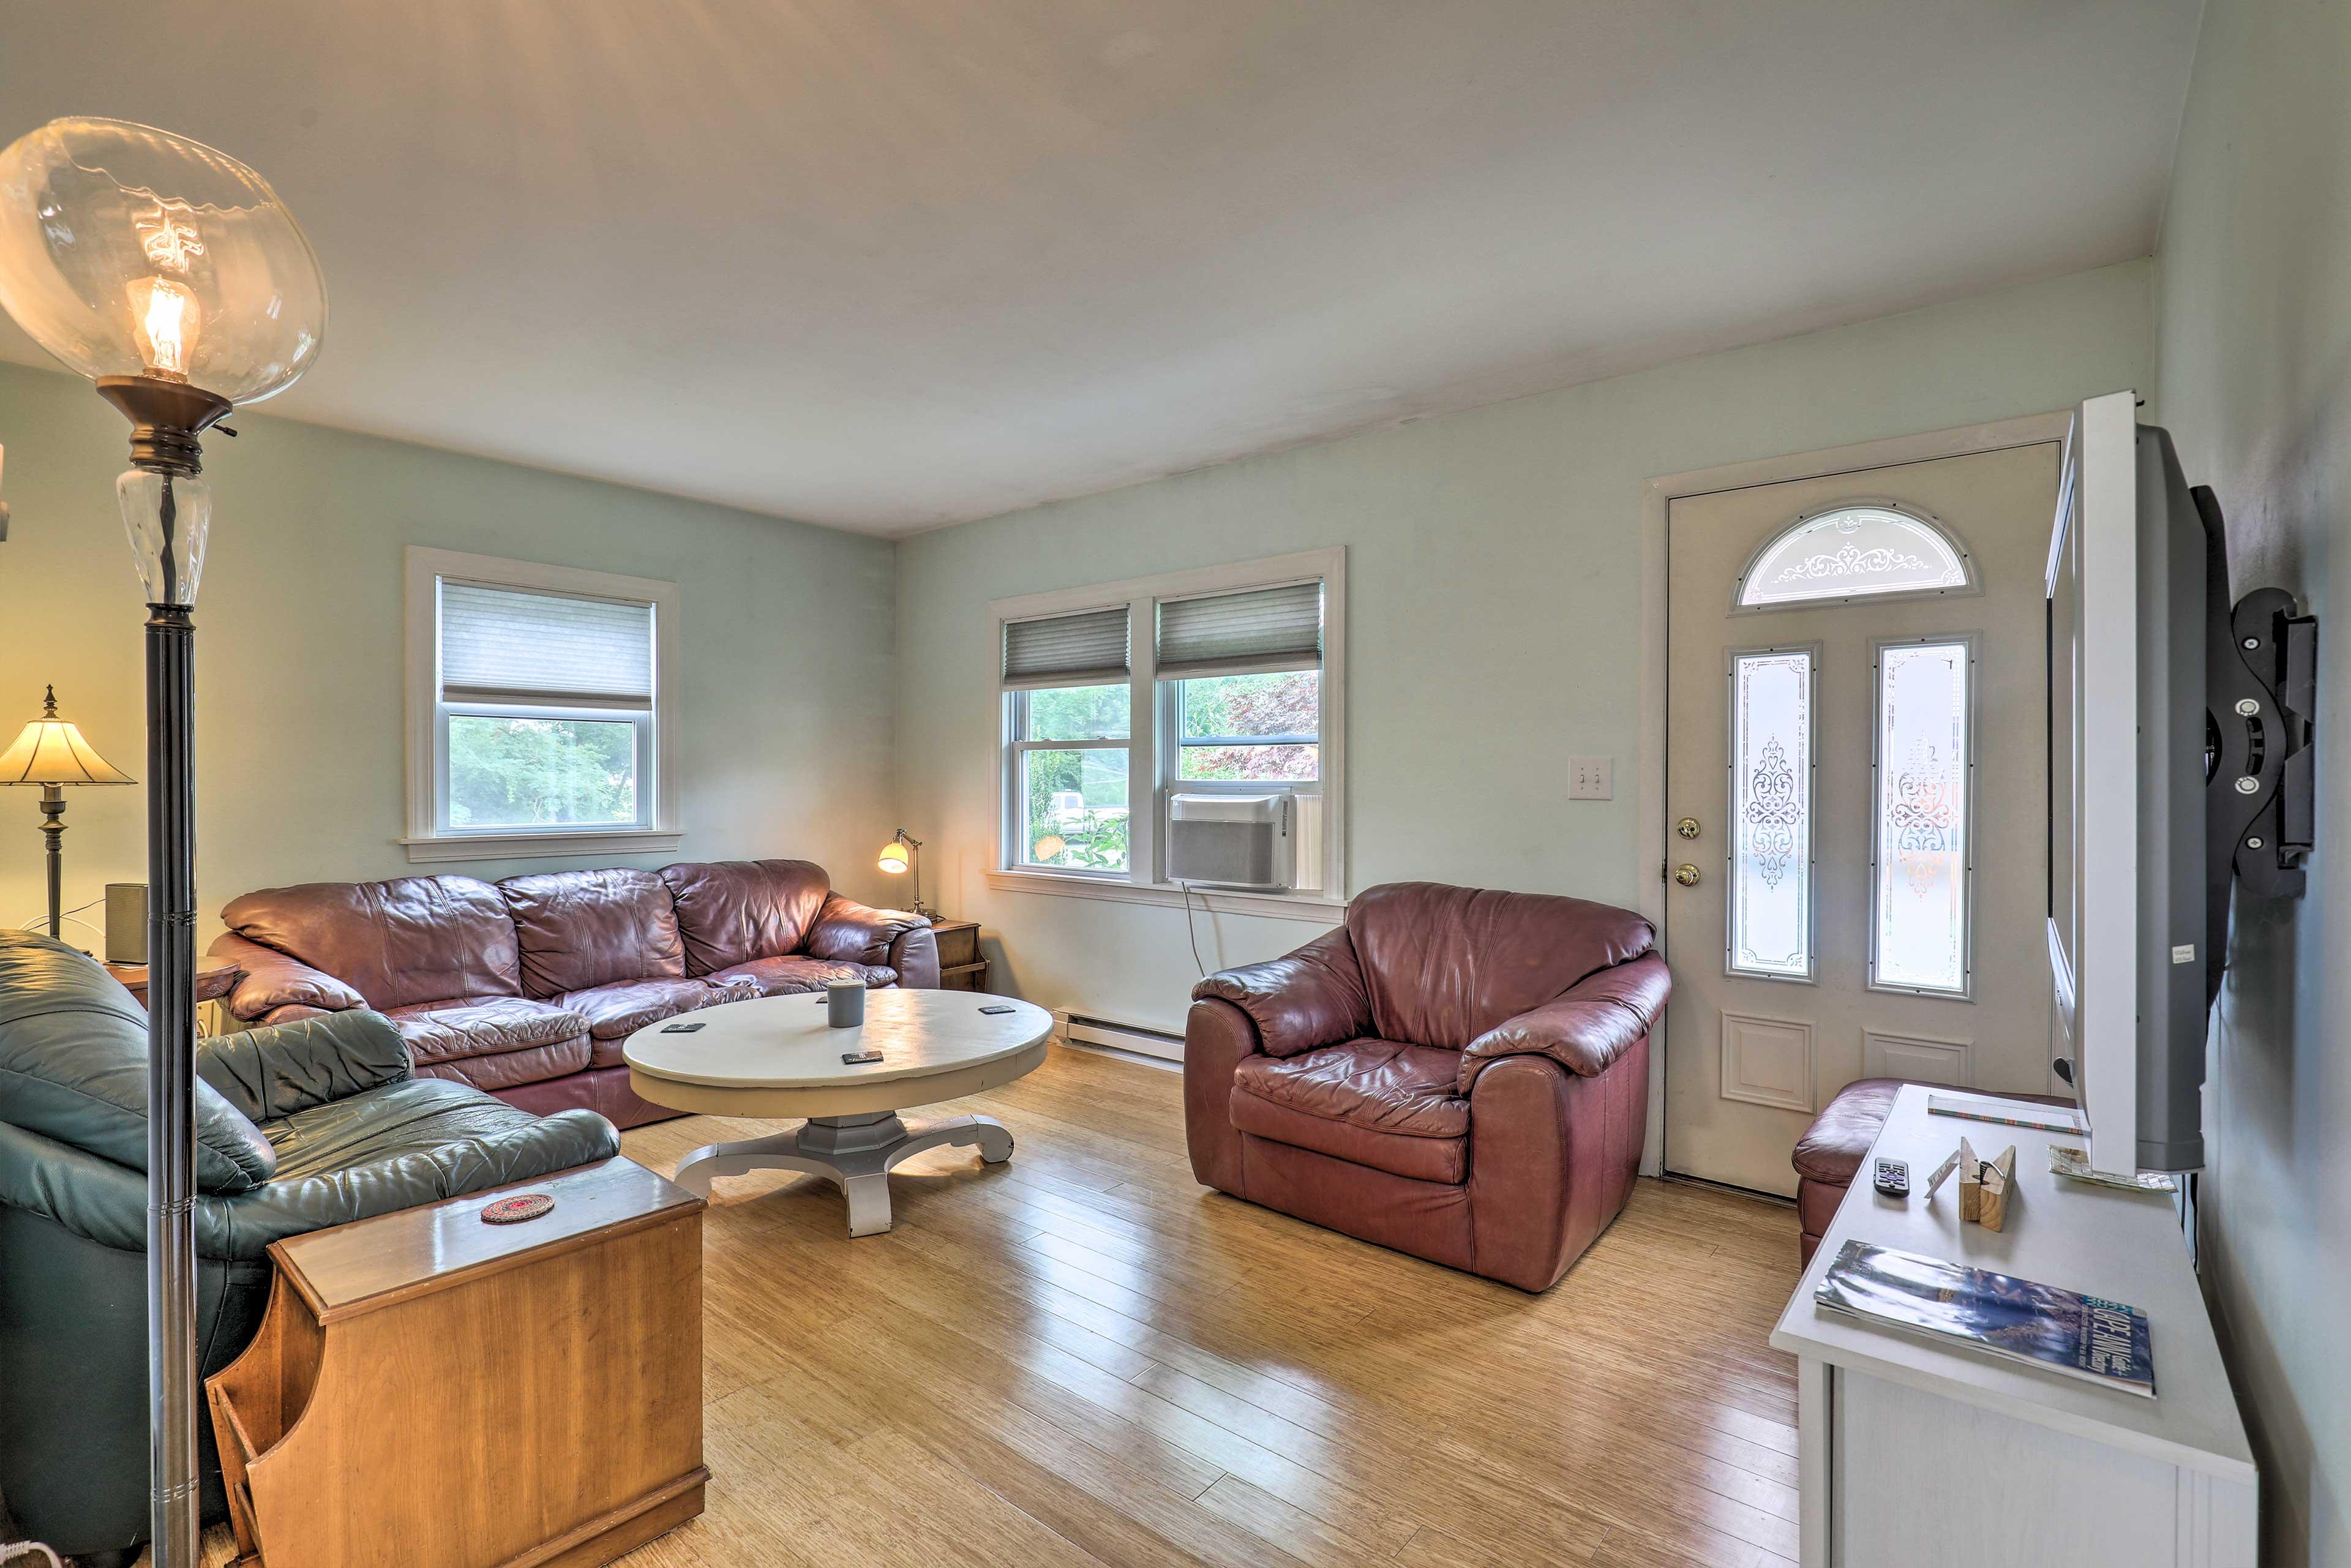 Living Room | Window A/C Unit